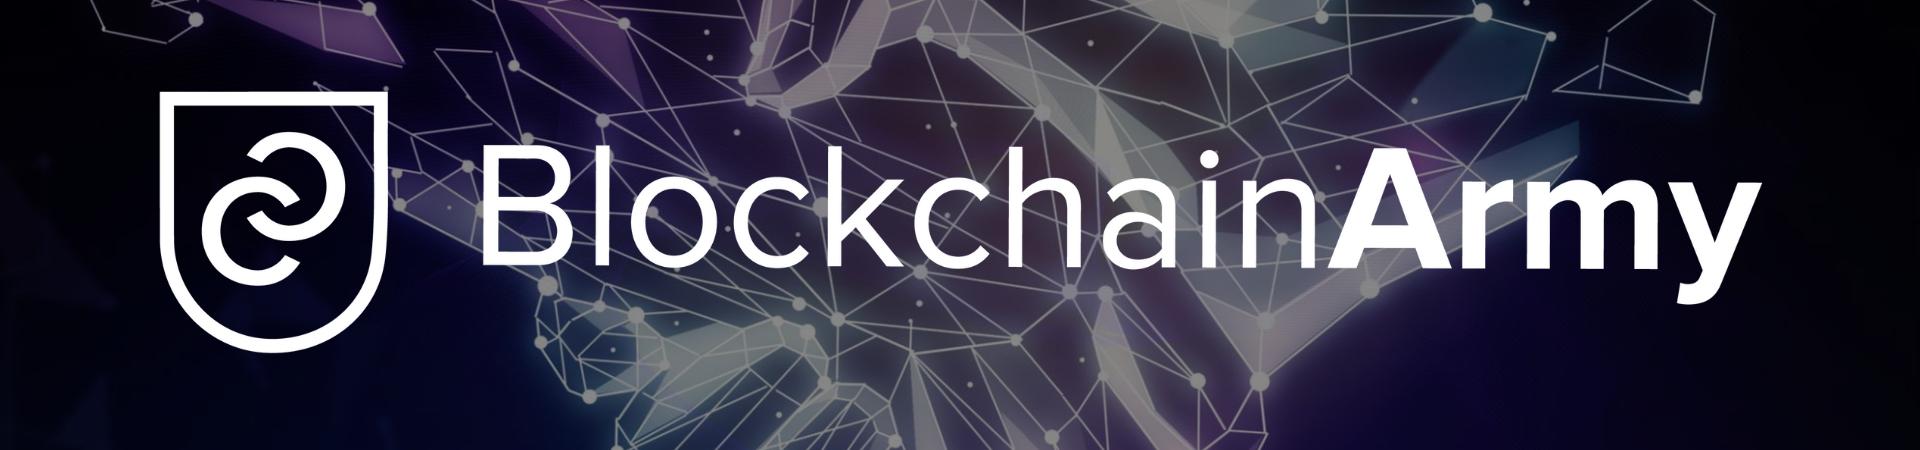 BlockchainArmy Announces Strategic Partnership with INFIbond